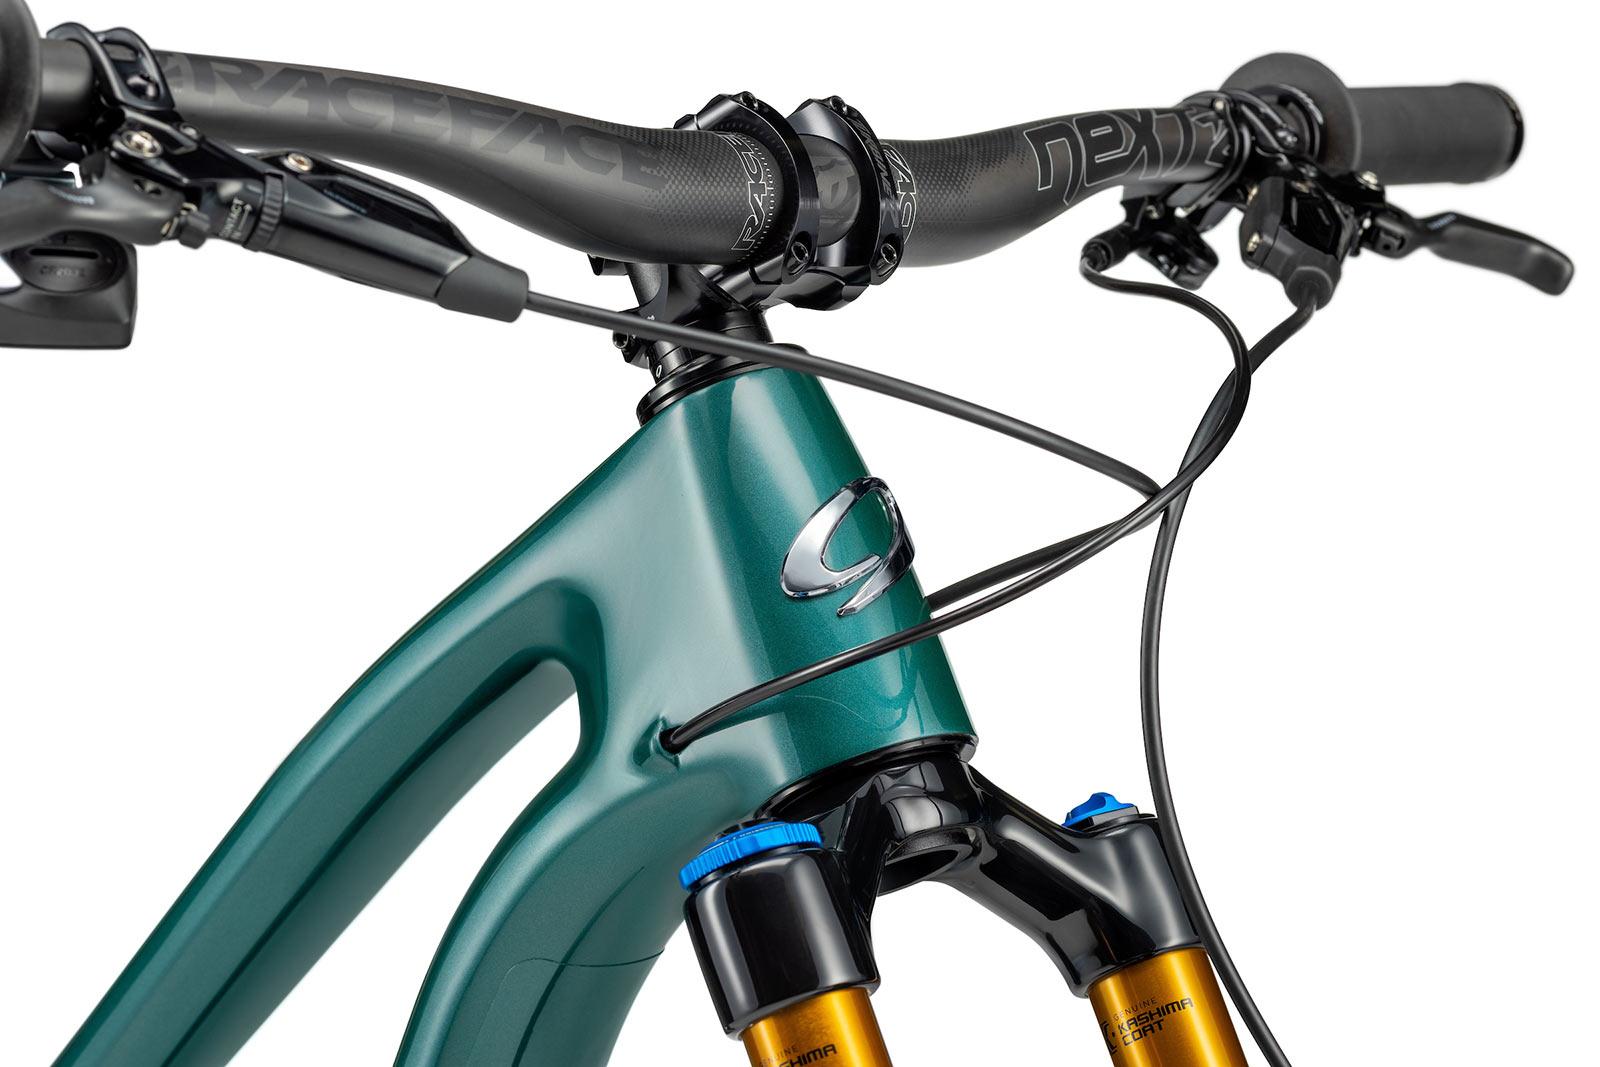 new niner jet 9 rdo trail mountain bike closeup head tube details